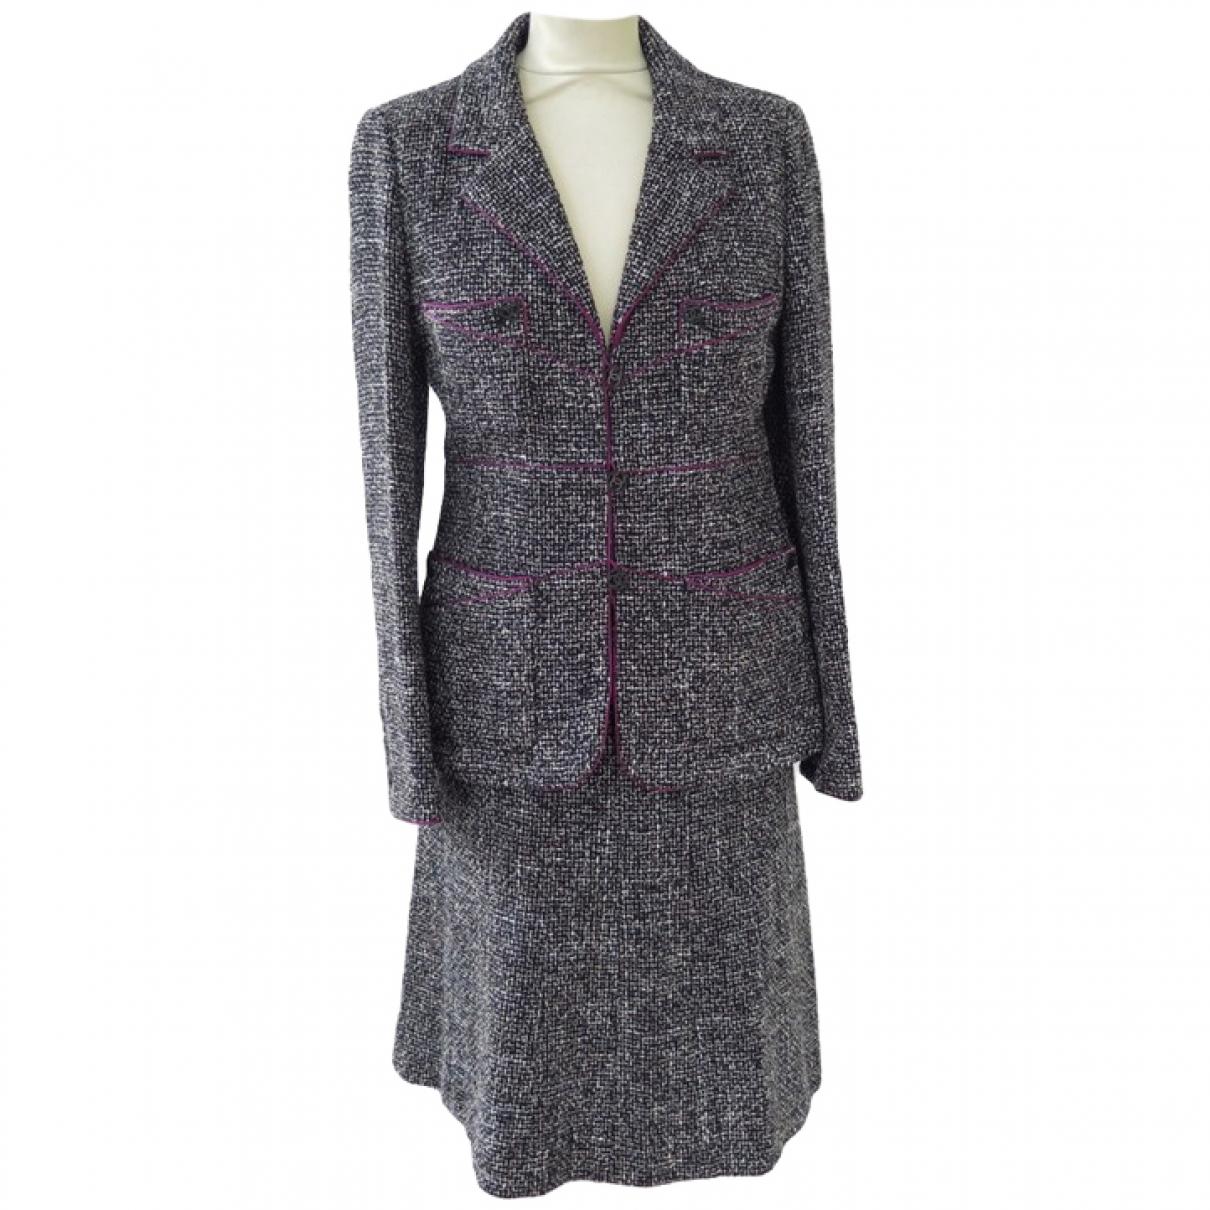 Chanel \N Black Tweed jacket for Women 38 FR